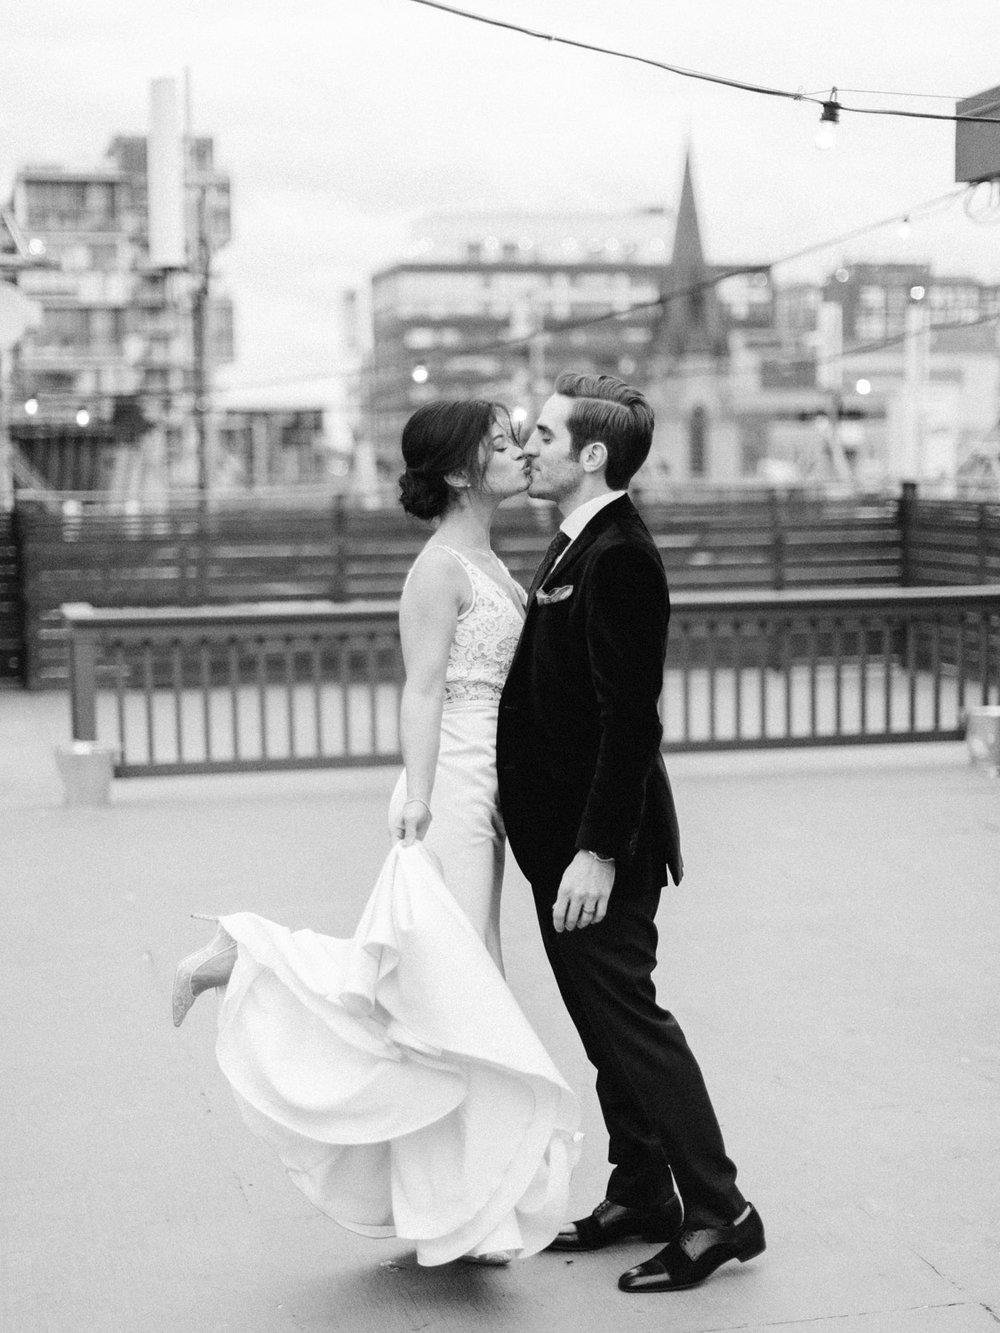 Toronto-wedding-photographer-intimate-italian-the-burroughes-downtown127.jpg